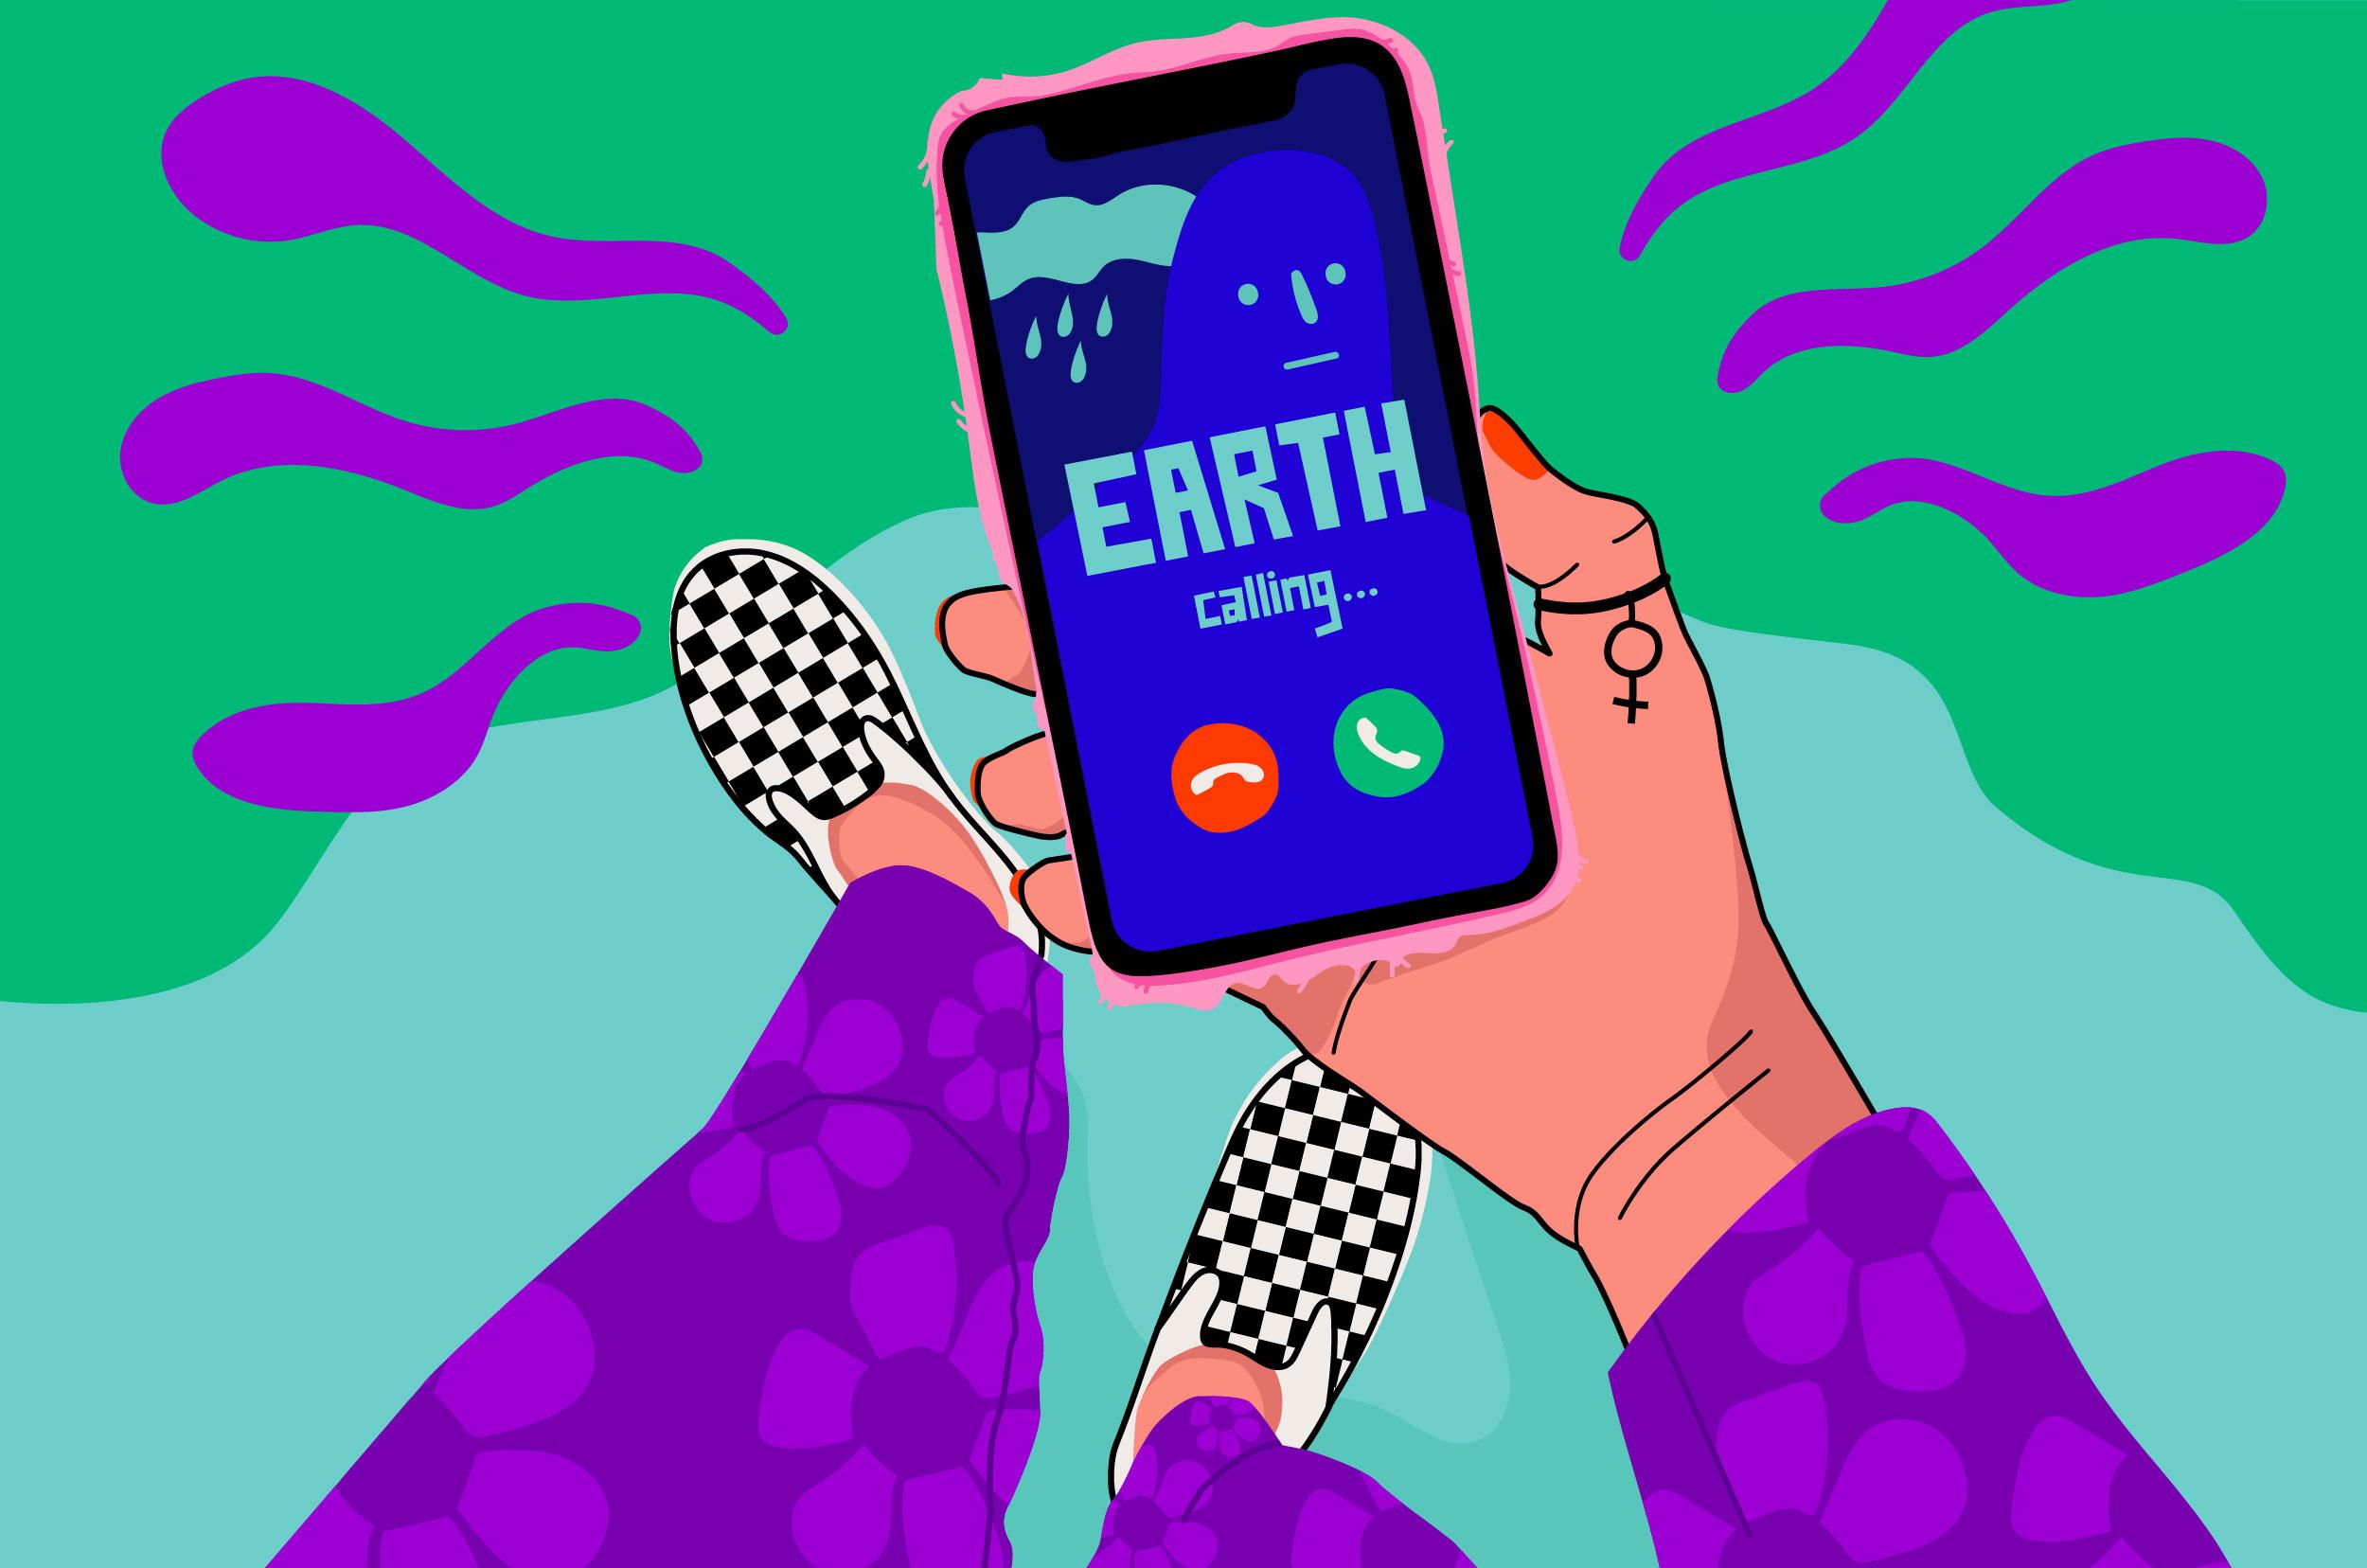 Earth calling